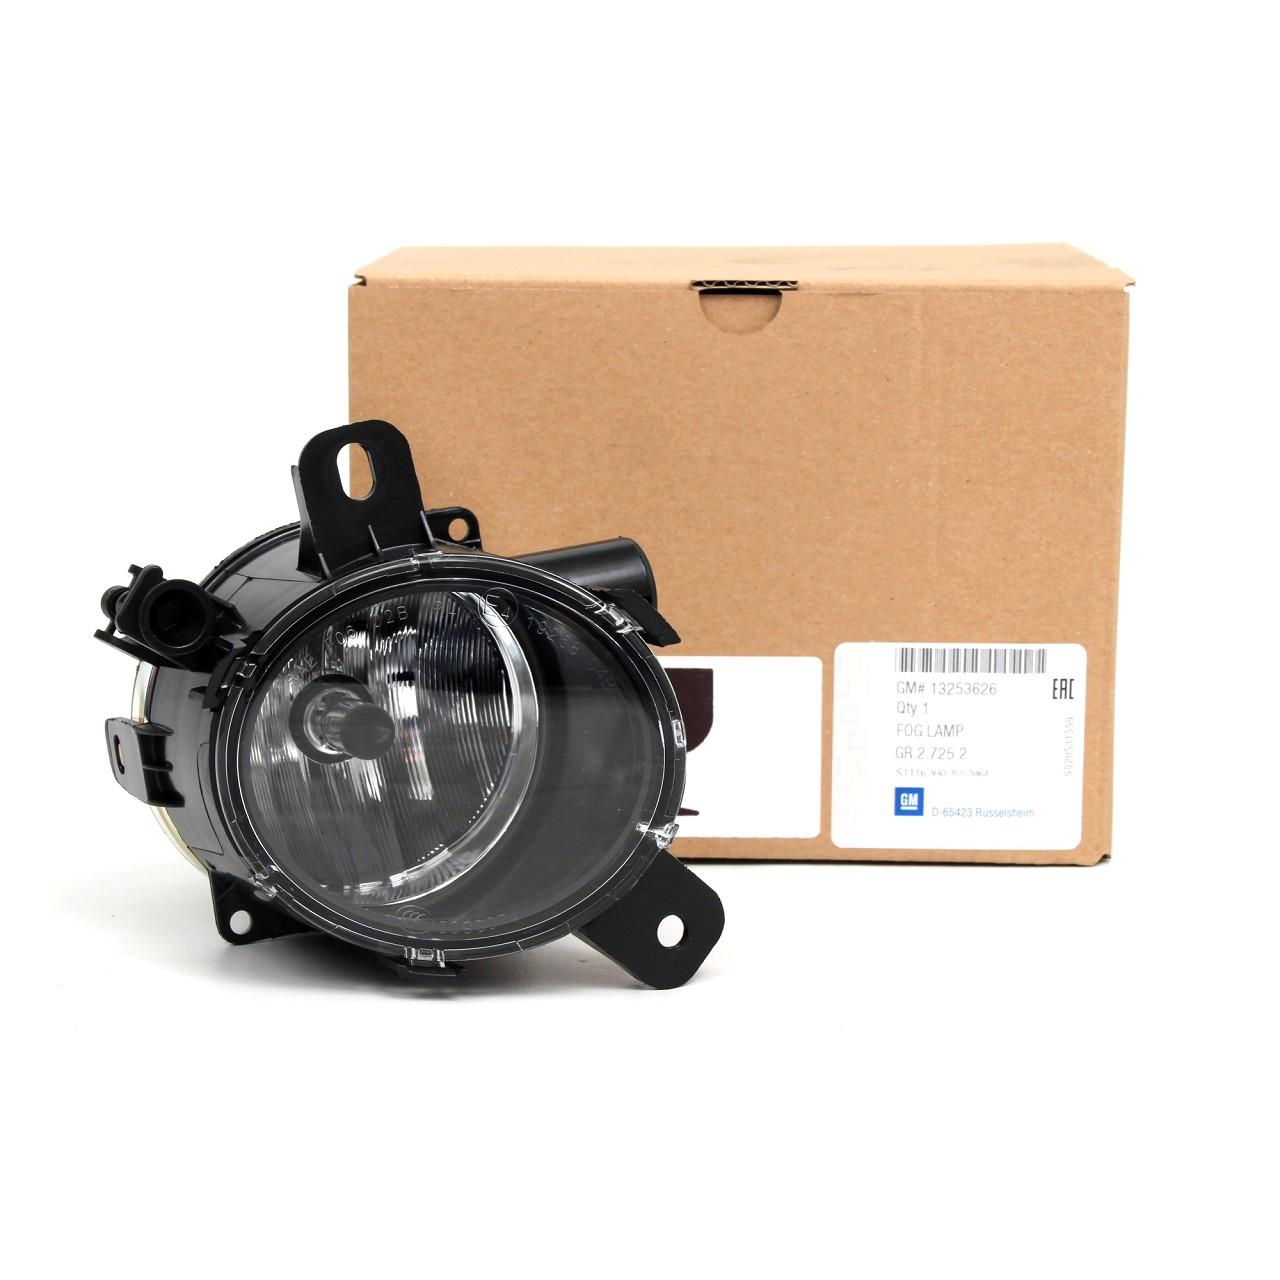 ORIGINAL GM Opel Nebelscheinwerfer VORNE RECHTS 13253626 für CORSA D E MERIVA B